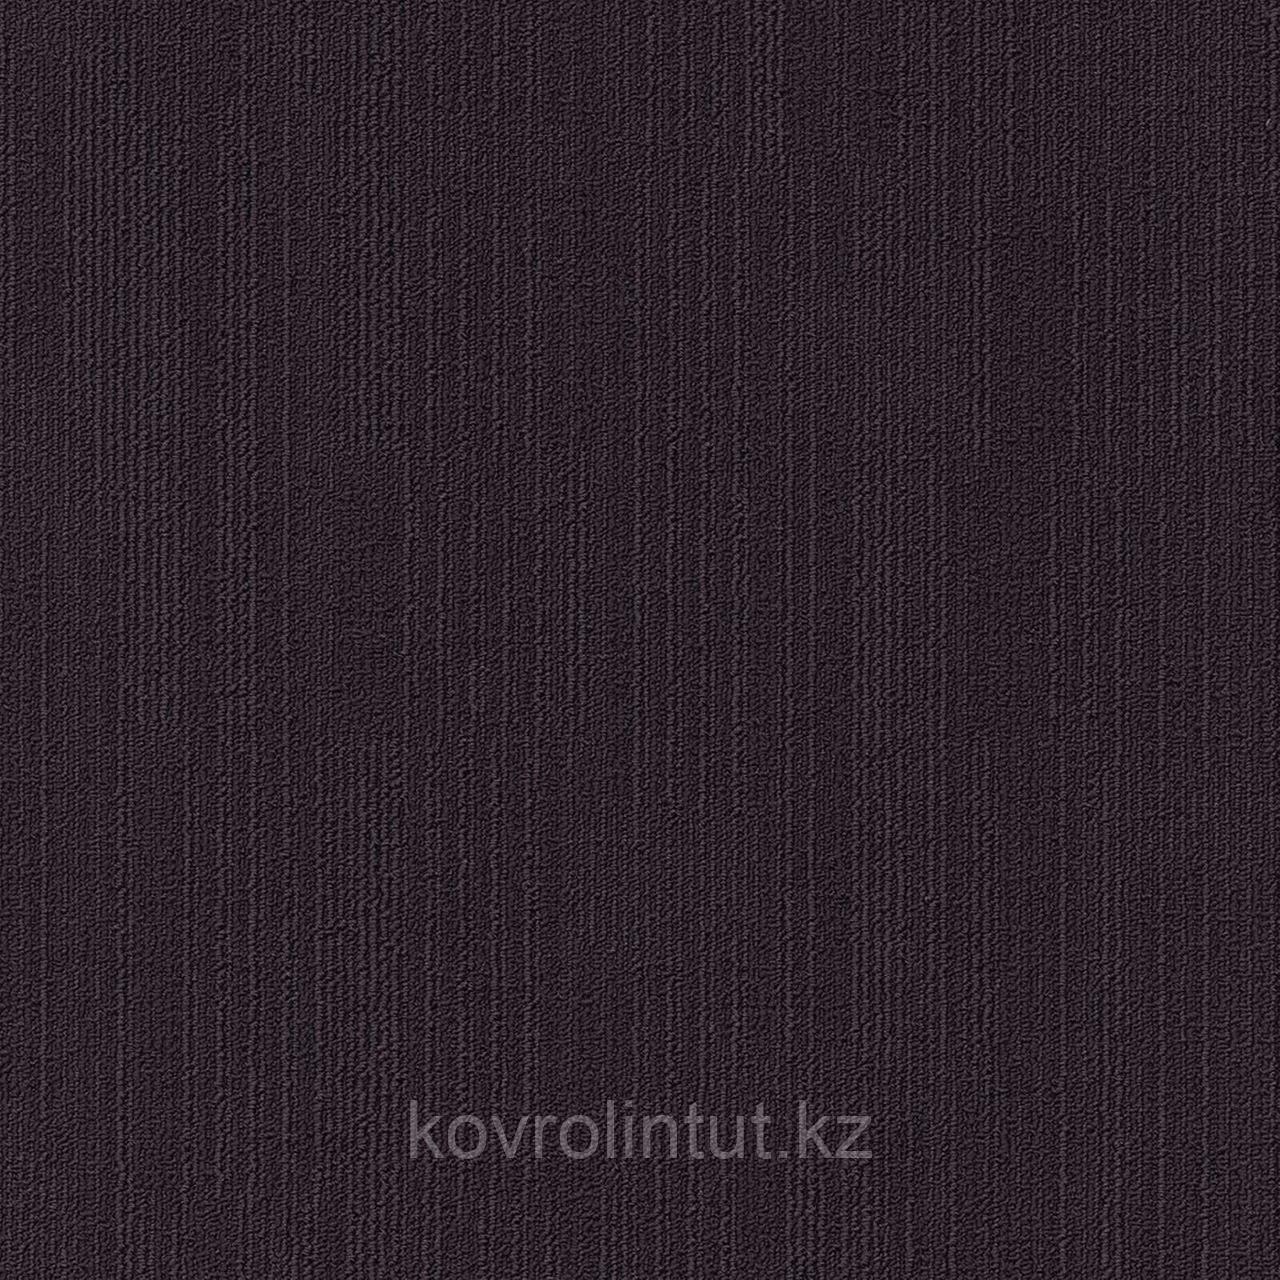 Плитка ковровая Modulyss Fashion 830, 100% PA